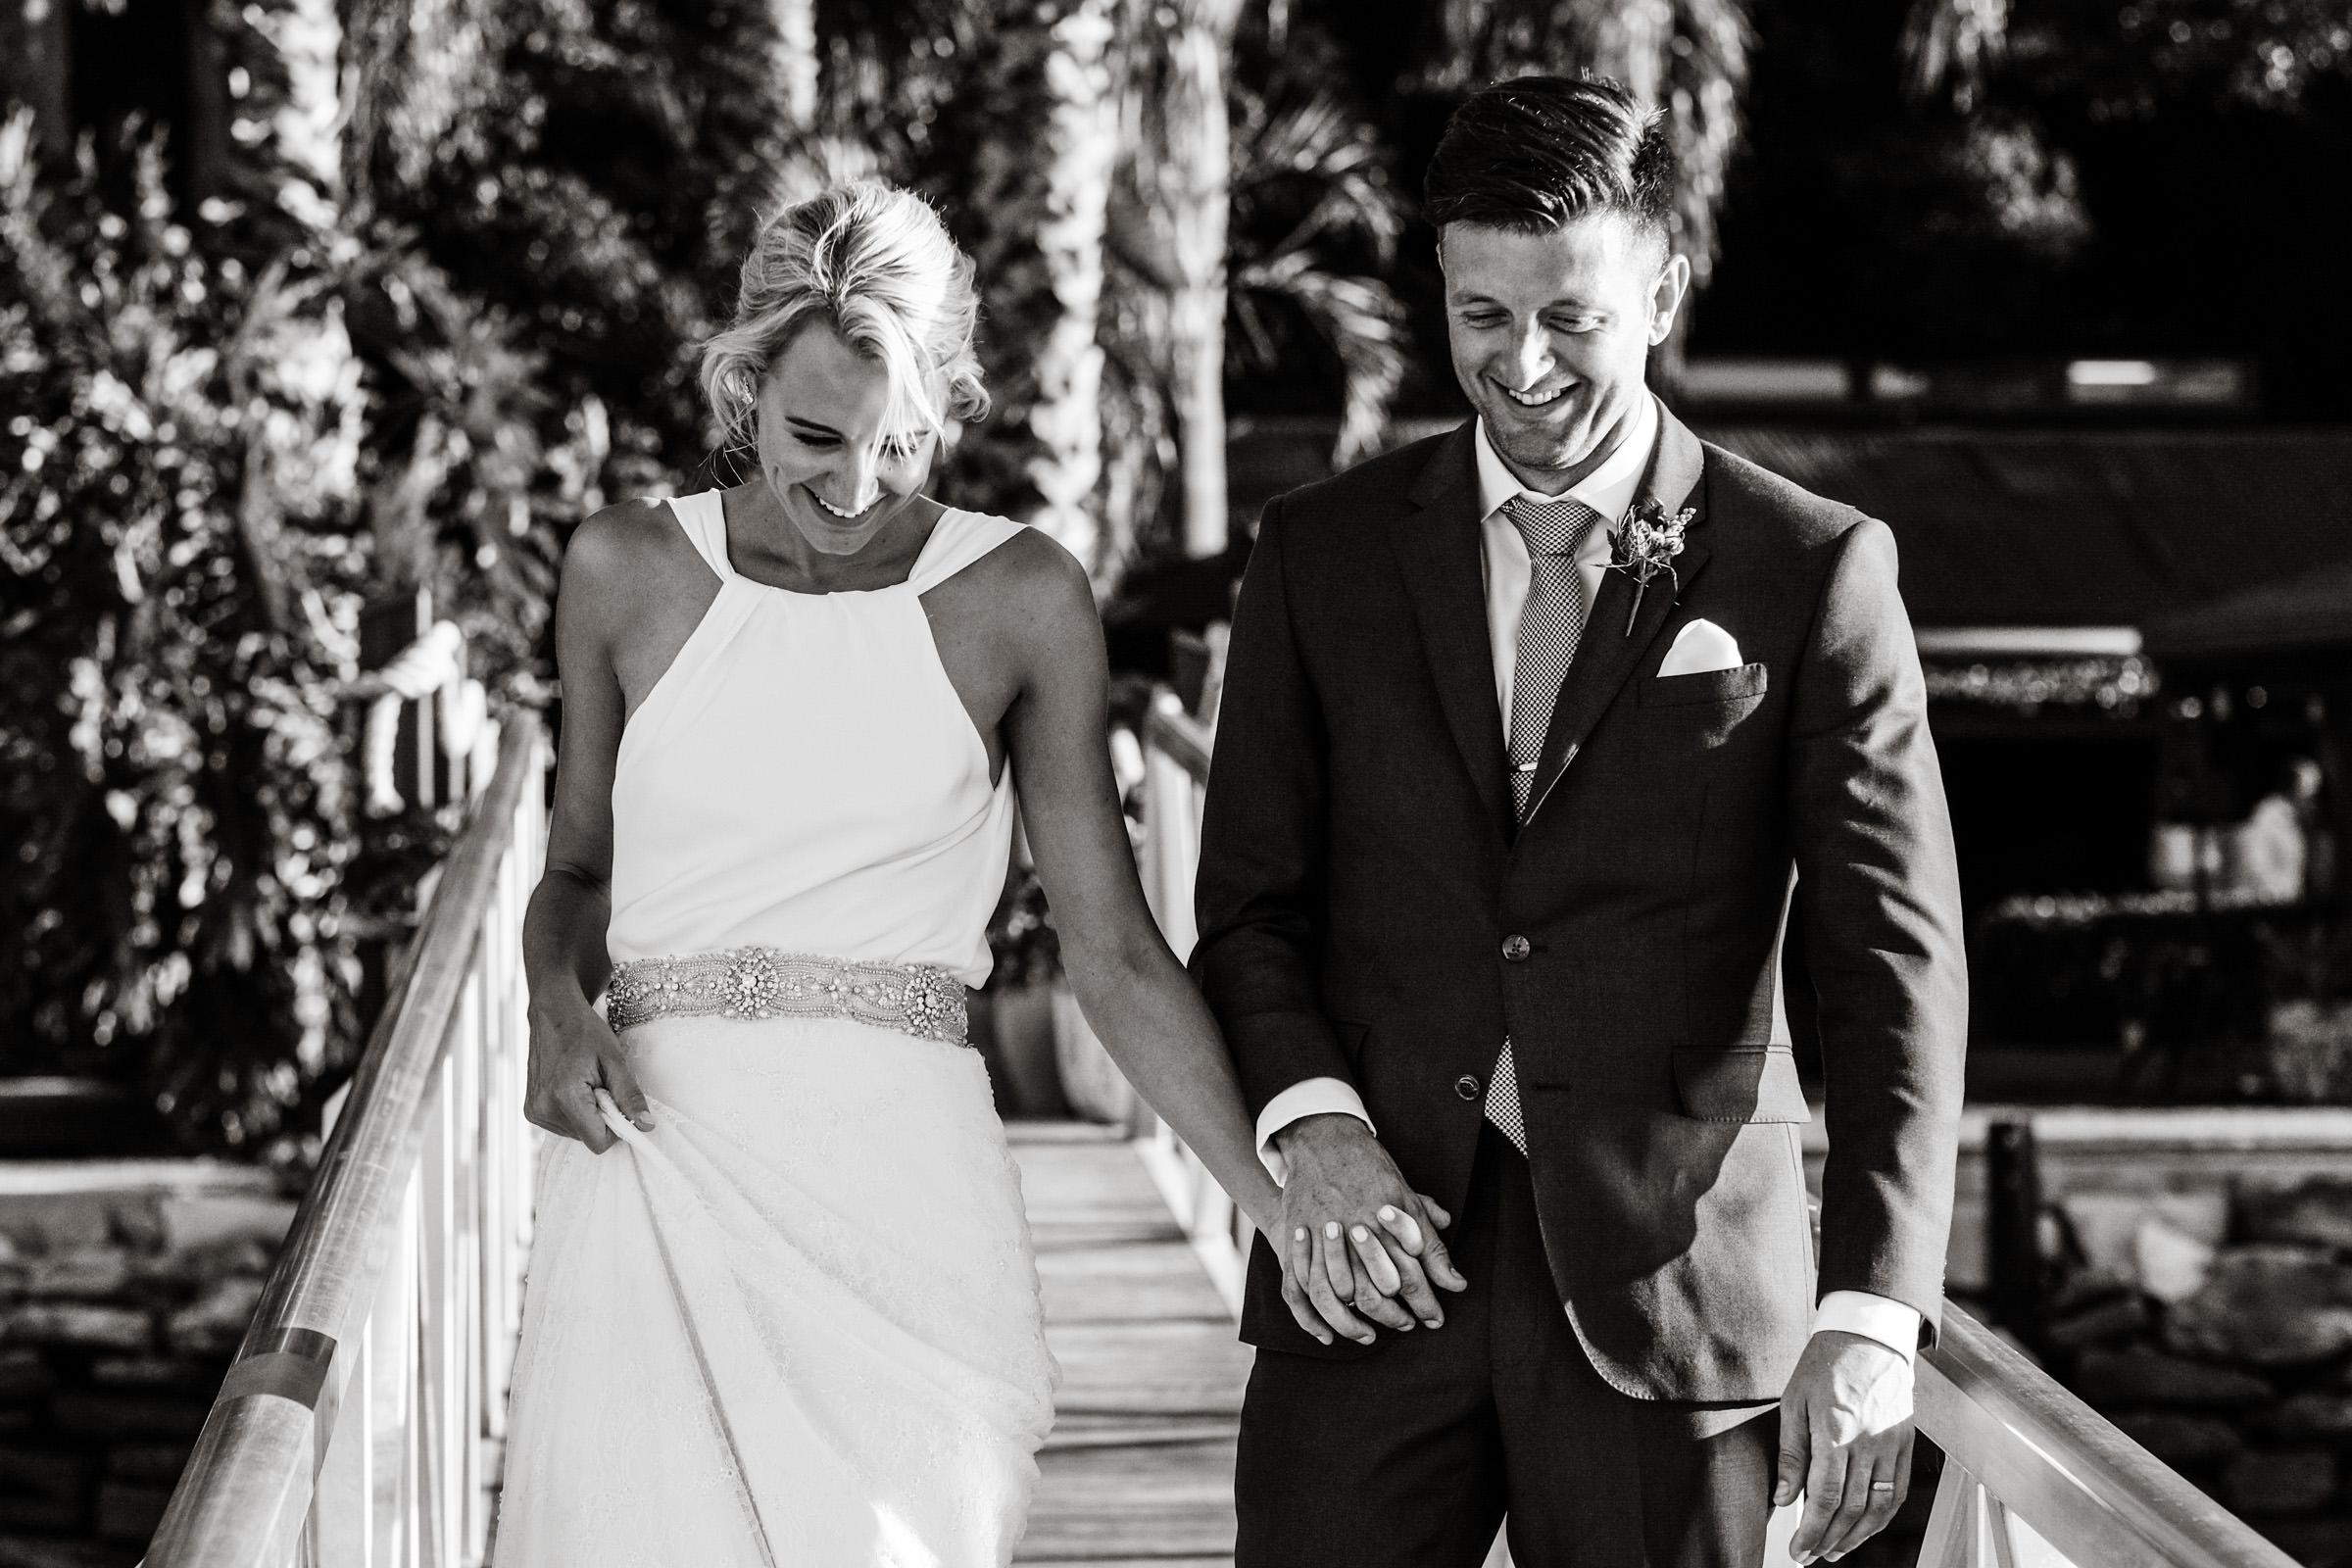 Peats+Bite+Wedding+Photography+018.jpg